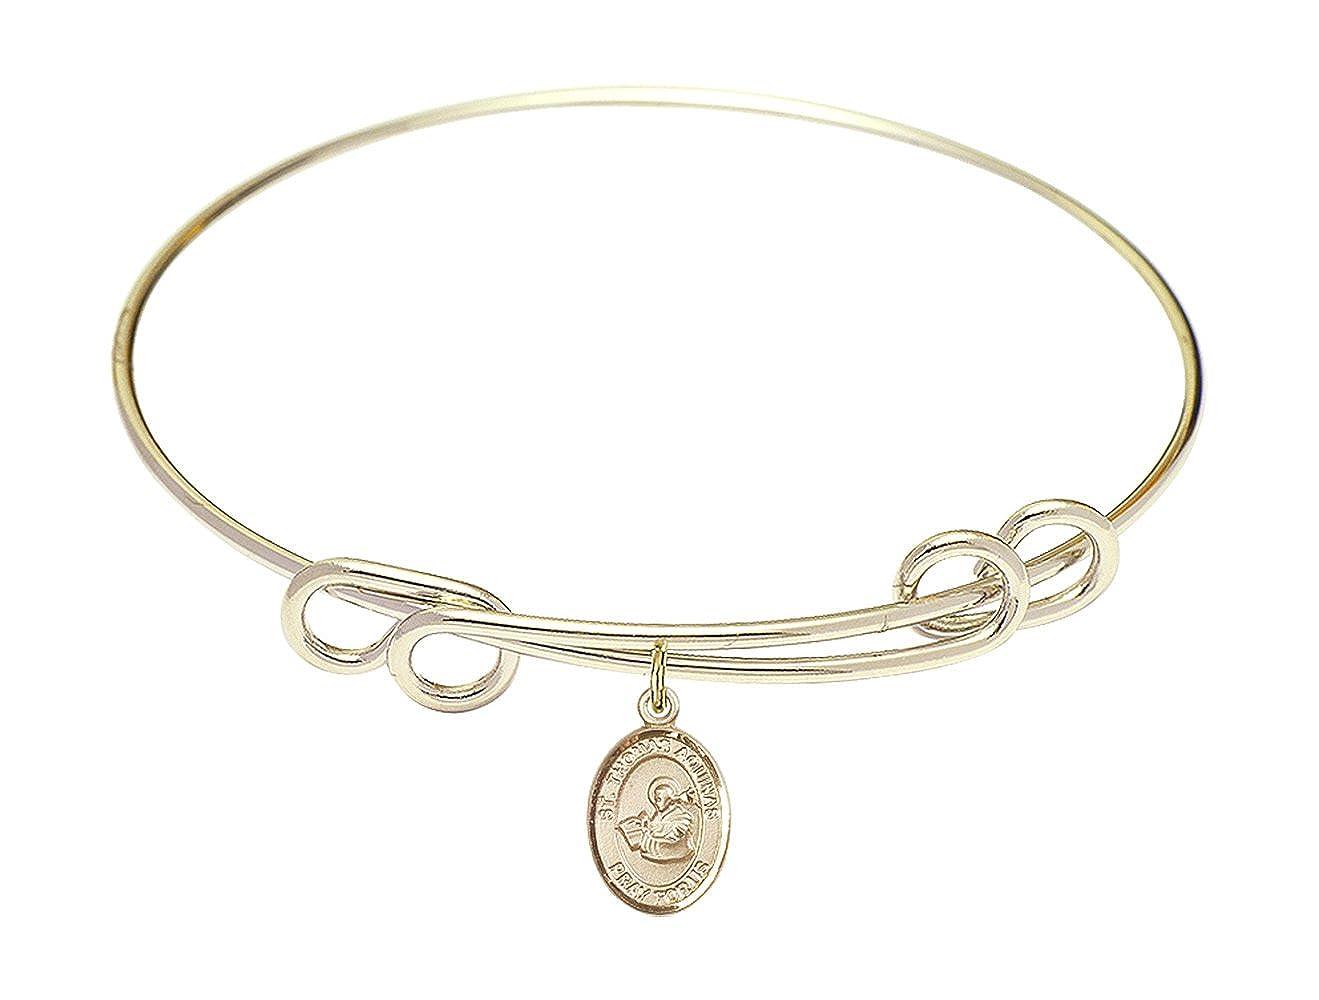 DiamondJewelryNY Double Loop Bangle Bracelet with a St Thomas Aquinas Charm.